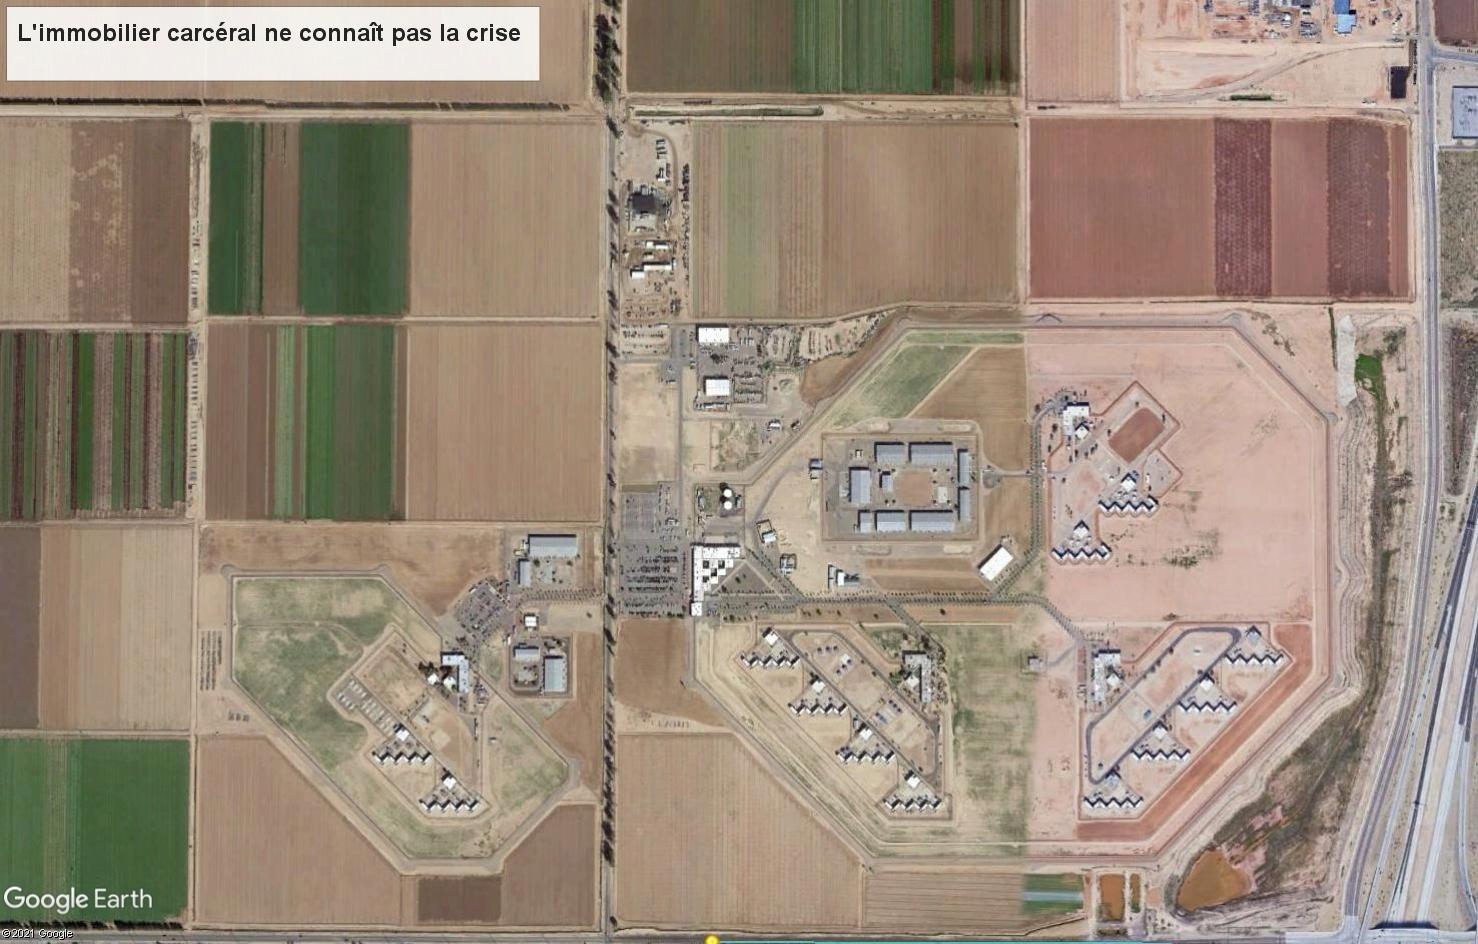 Si t'es pas sage, t'iras en prison... Perryville, Arizona Tsge2075